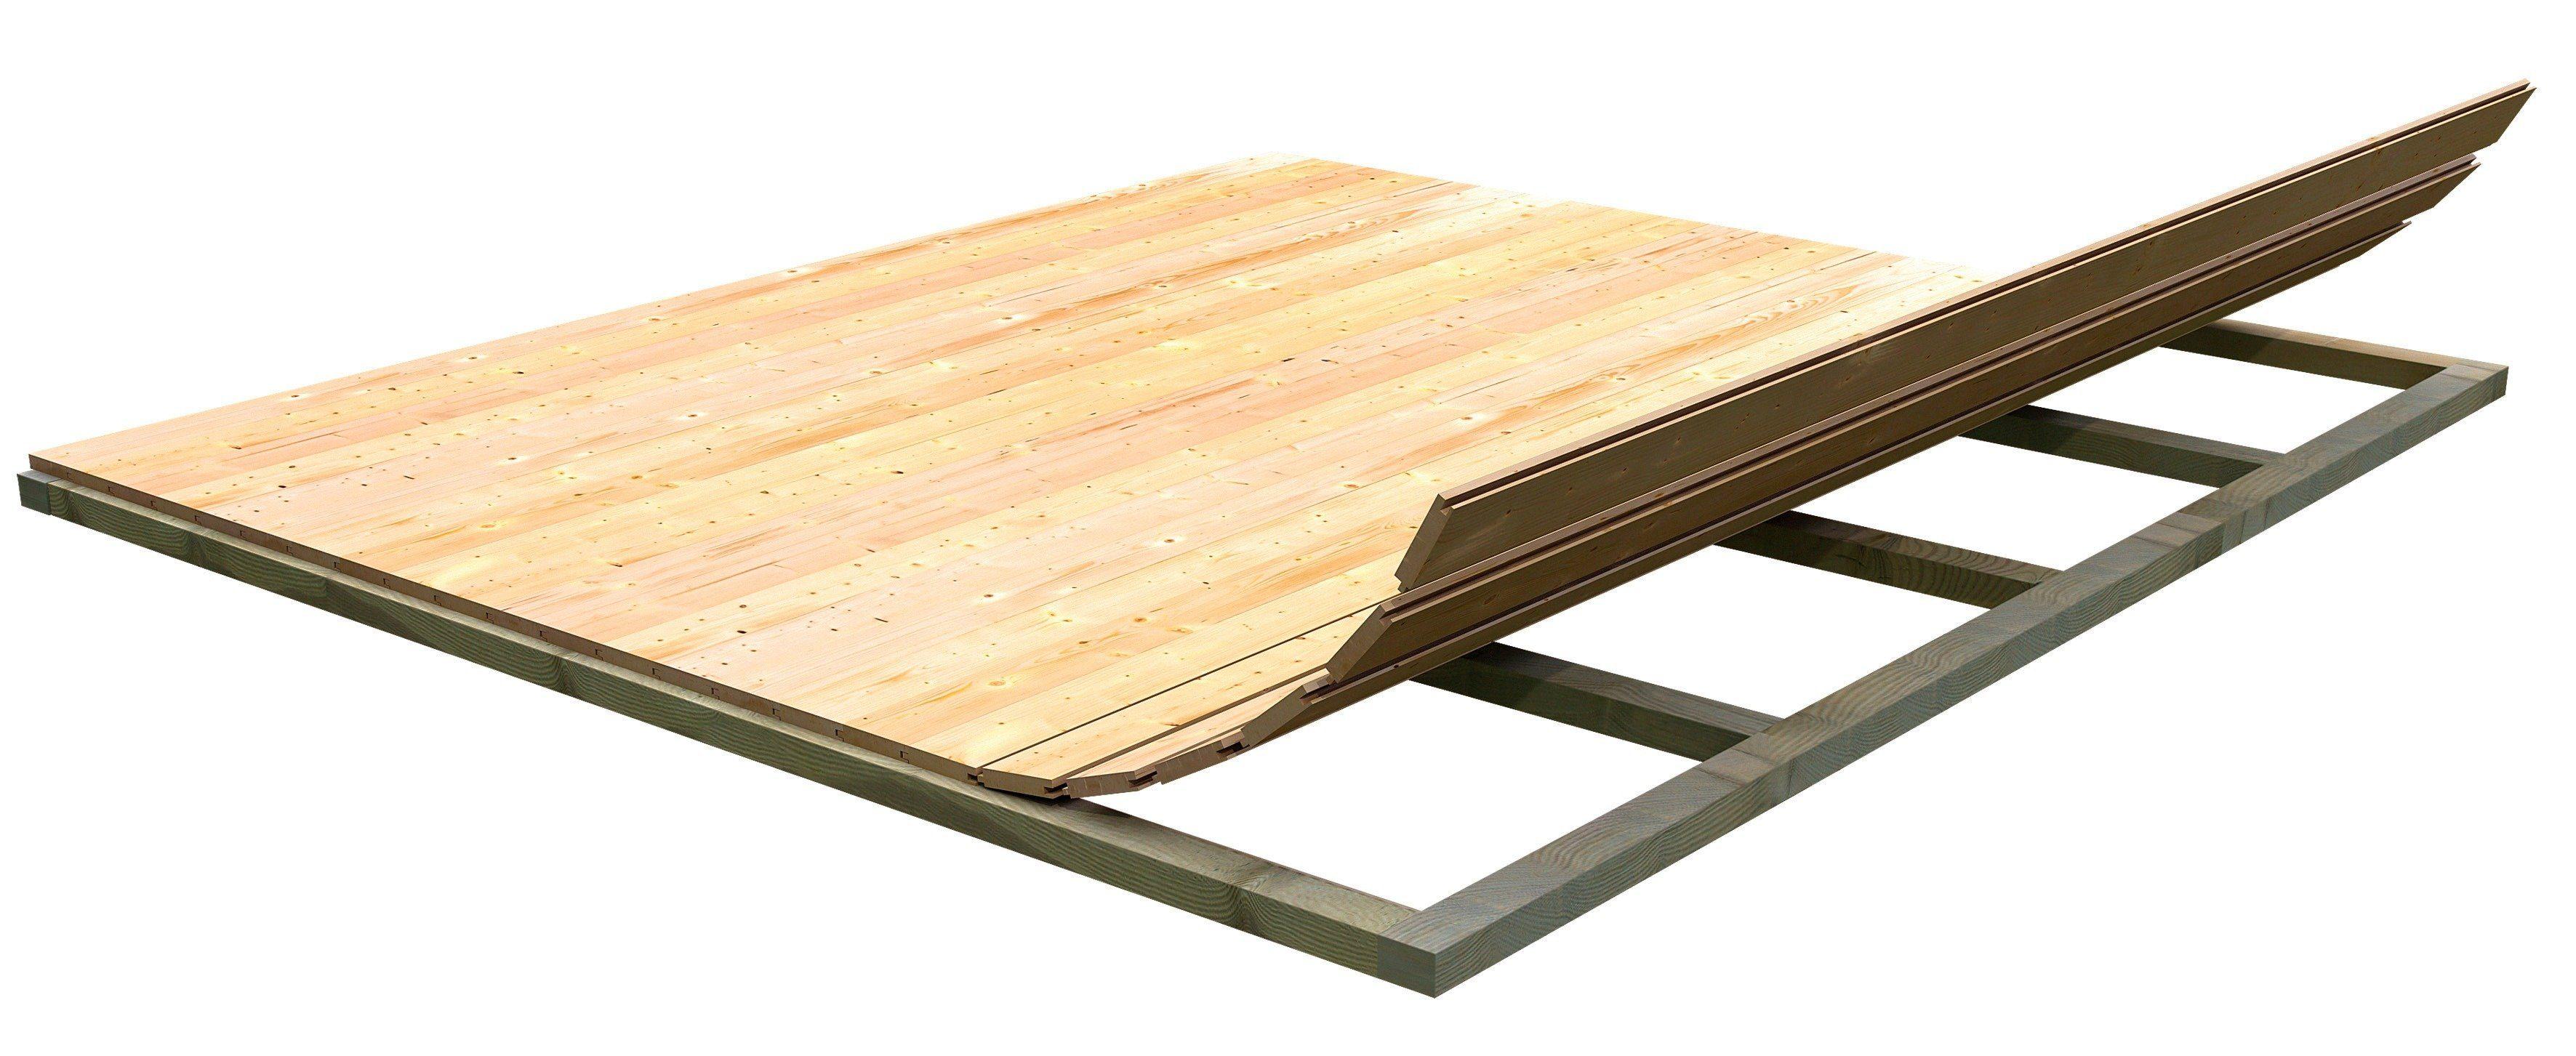 KARIBU Fußboden für Gartenhäuser , BxT: 340x230 cm